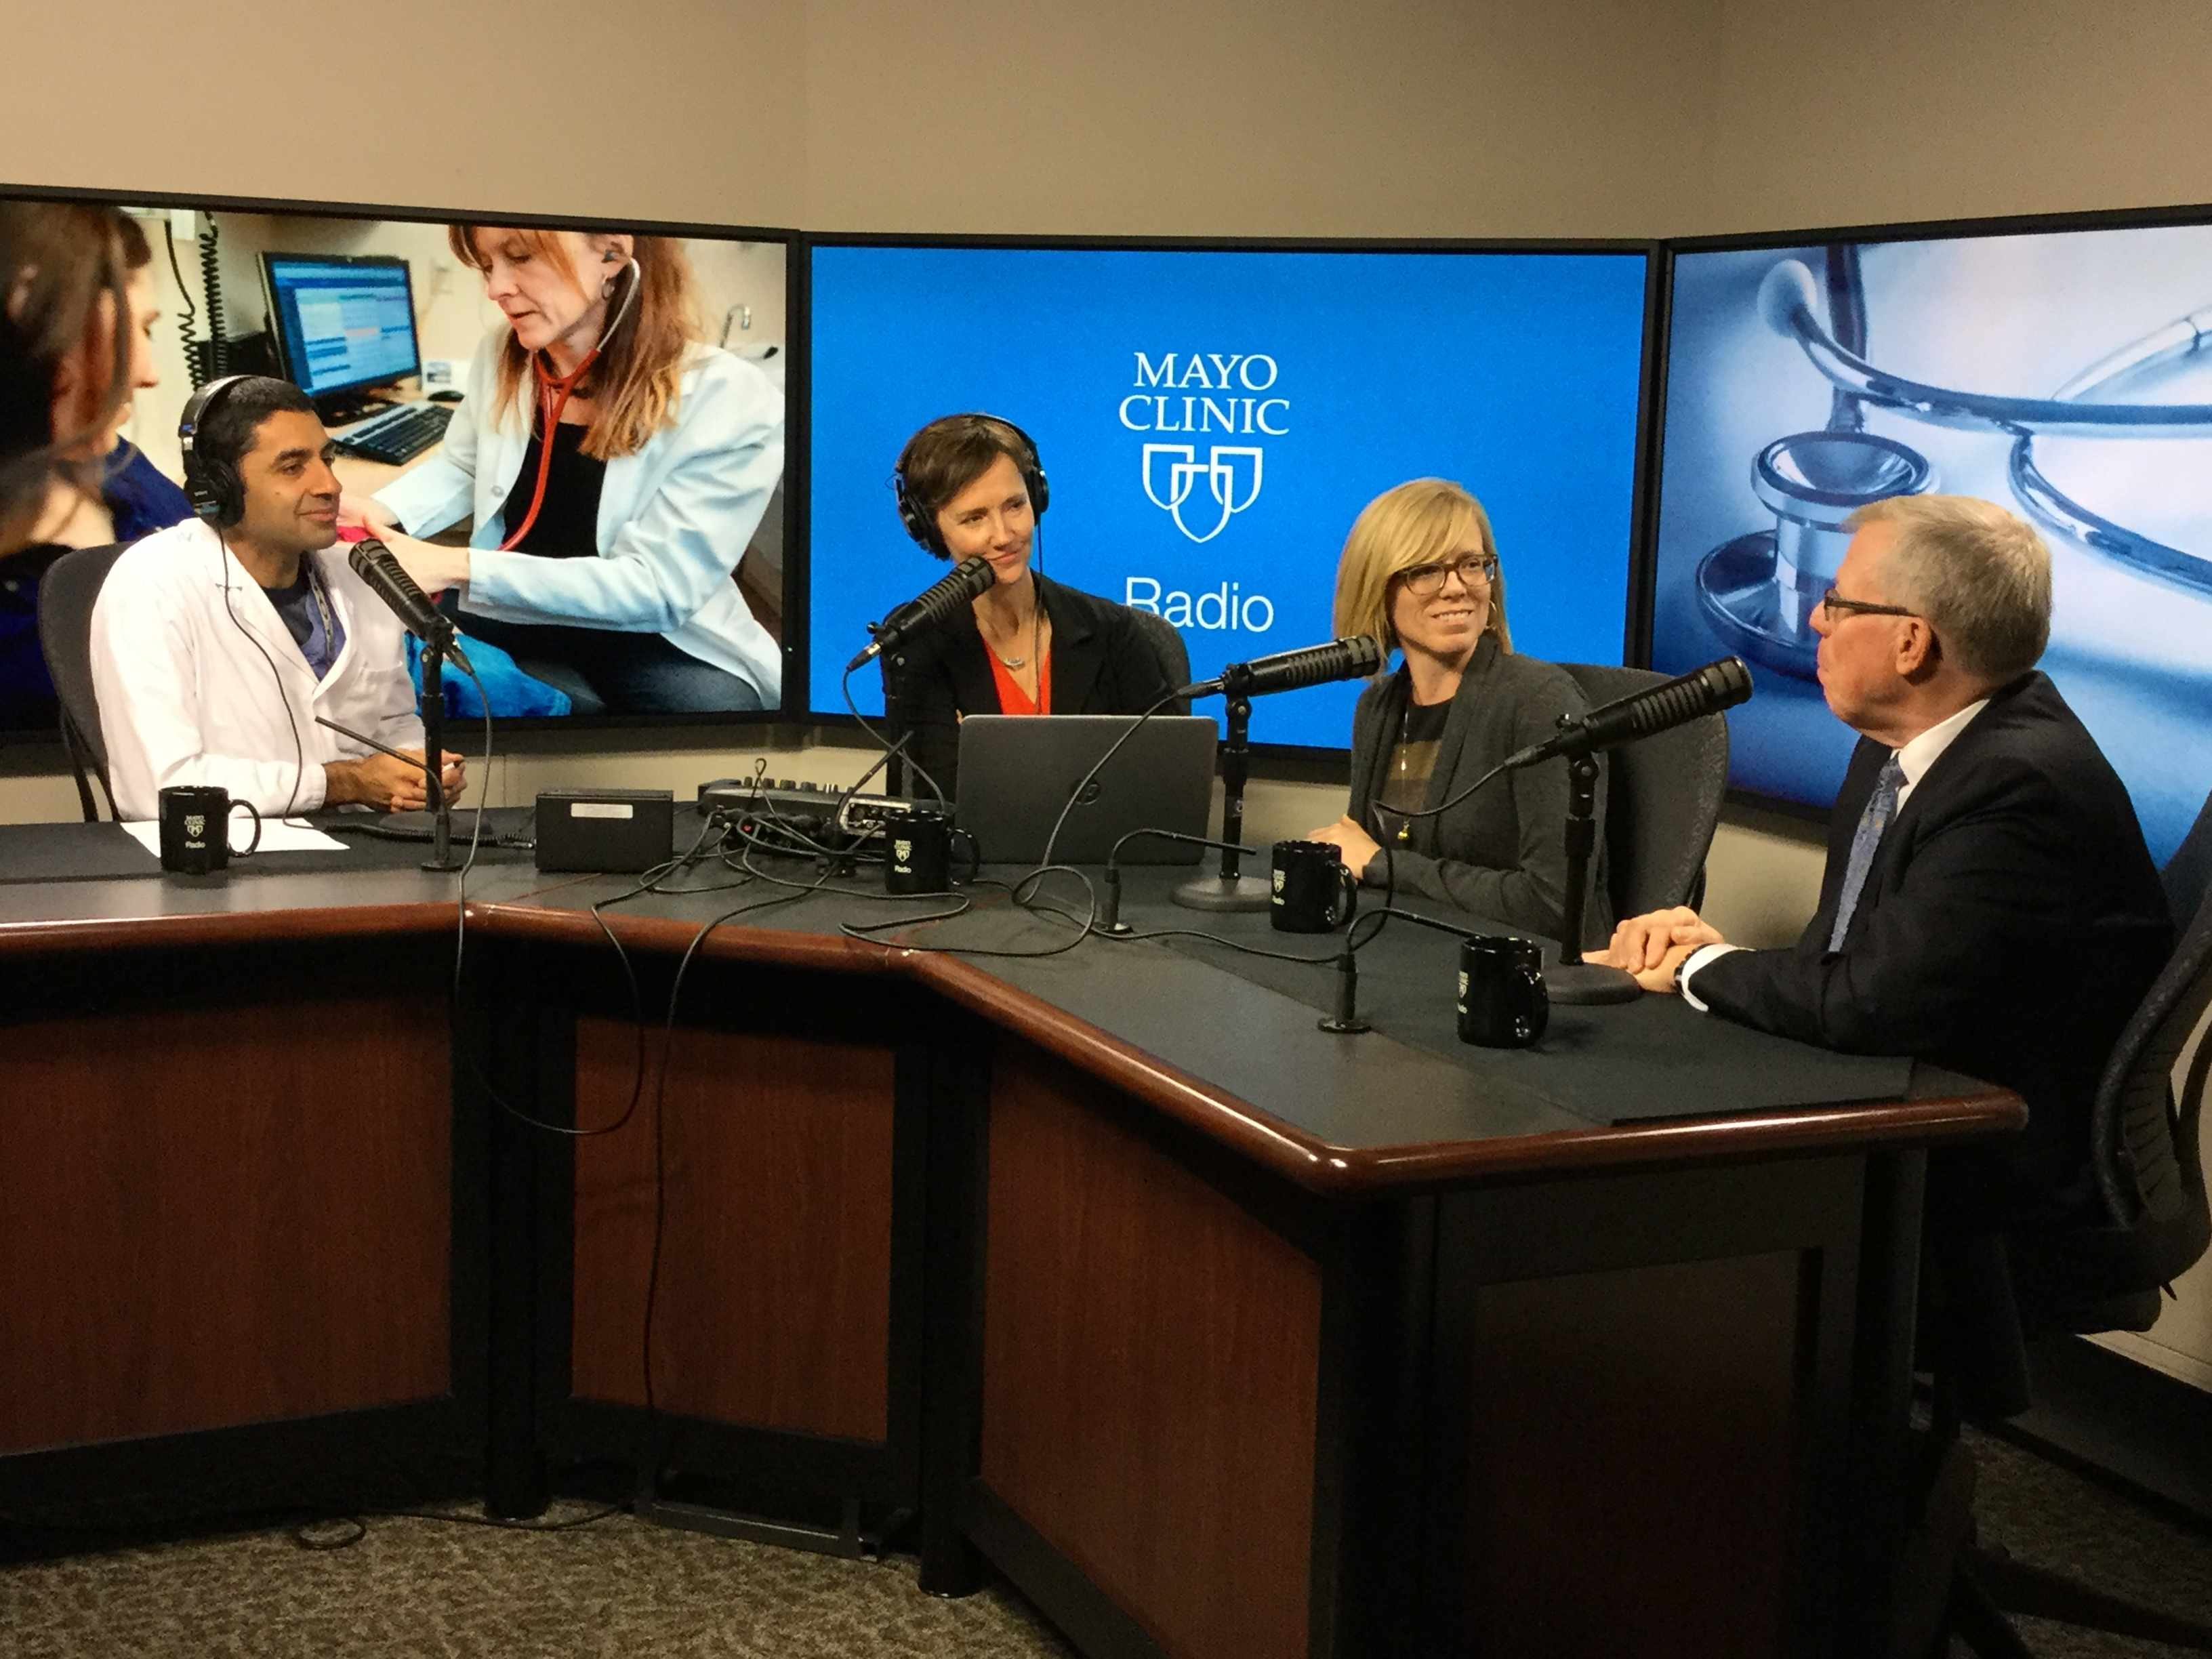 Dr. John Wilkinson and Dr. Elizabeth Cozine being interviewed on Mayo Clinic Radio